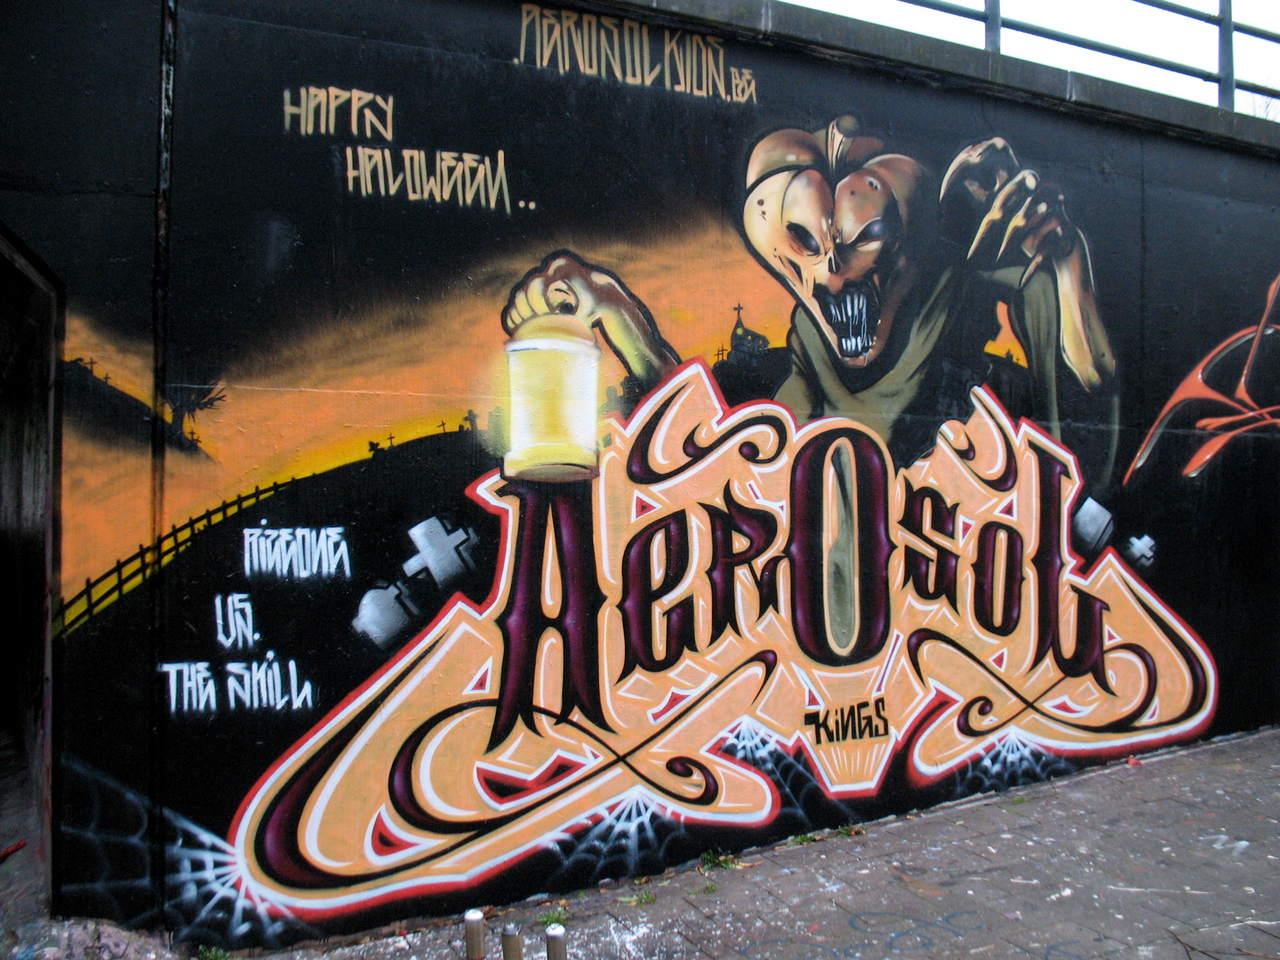 Bemerkenswerte GraffitiKunst